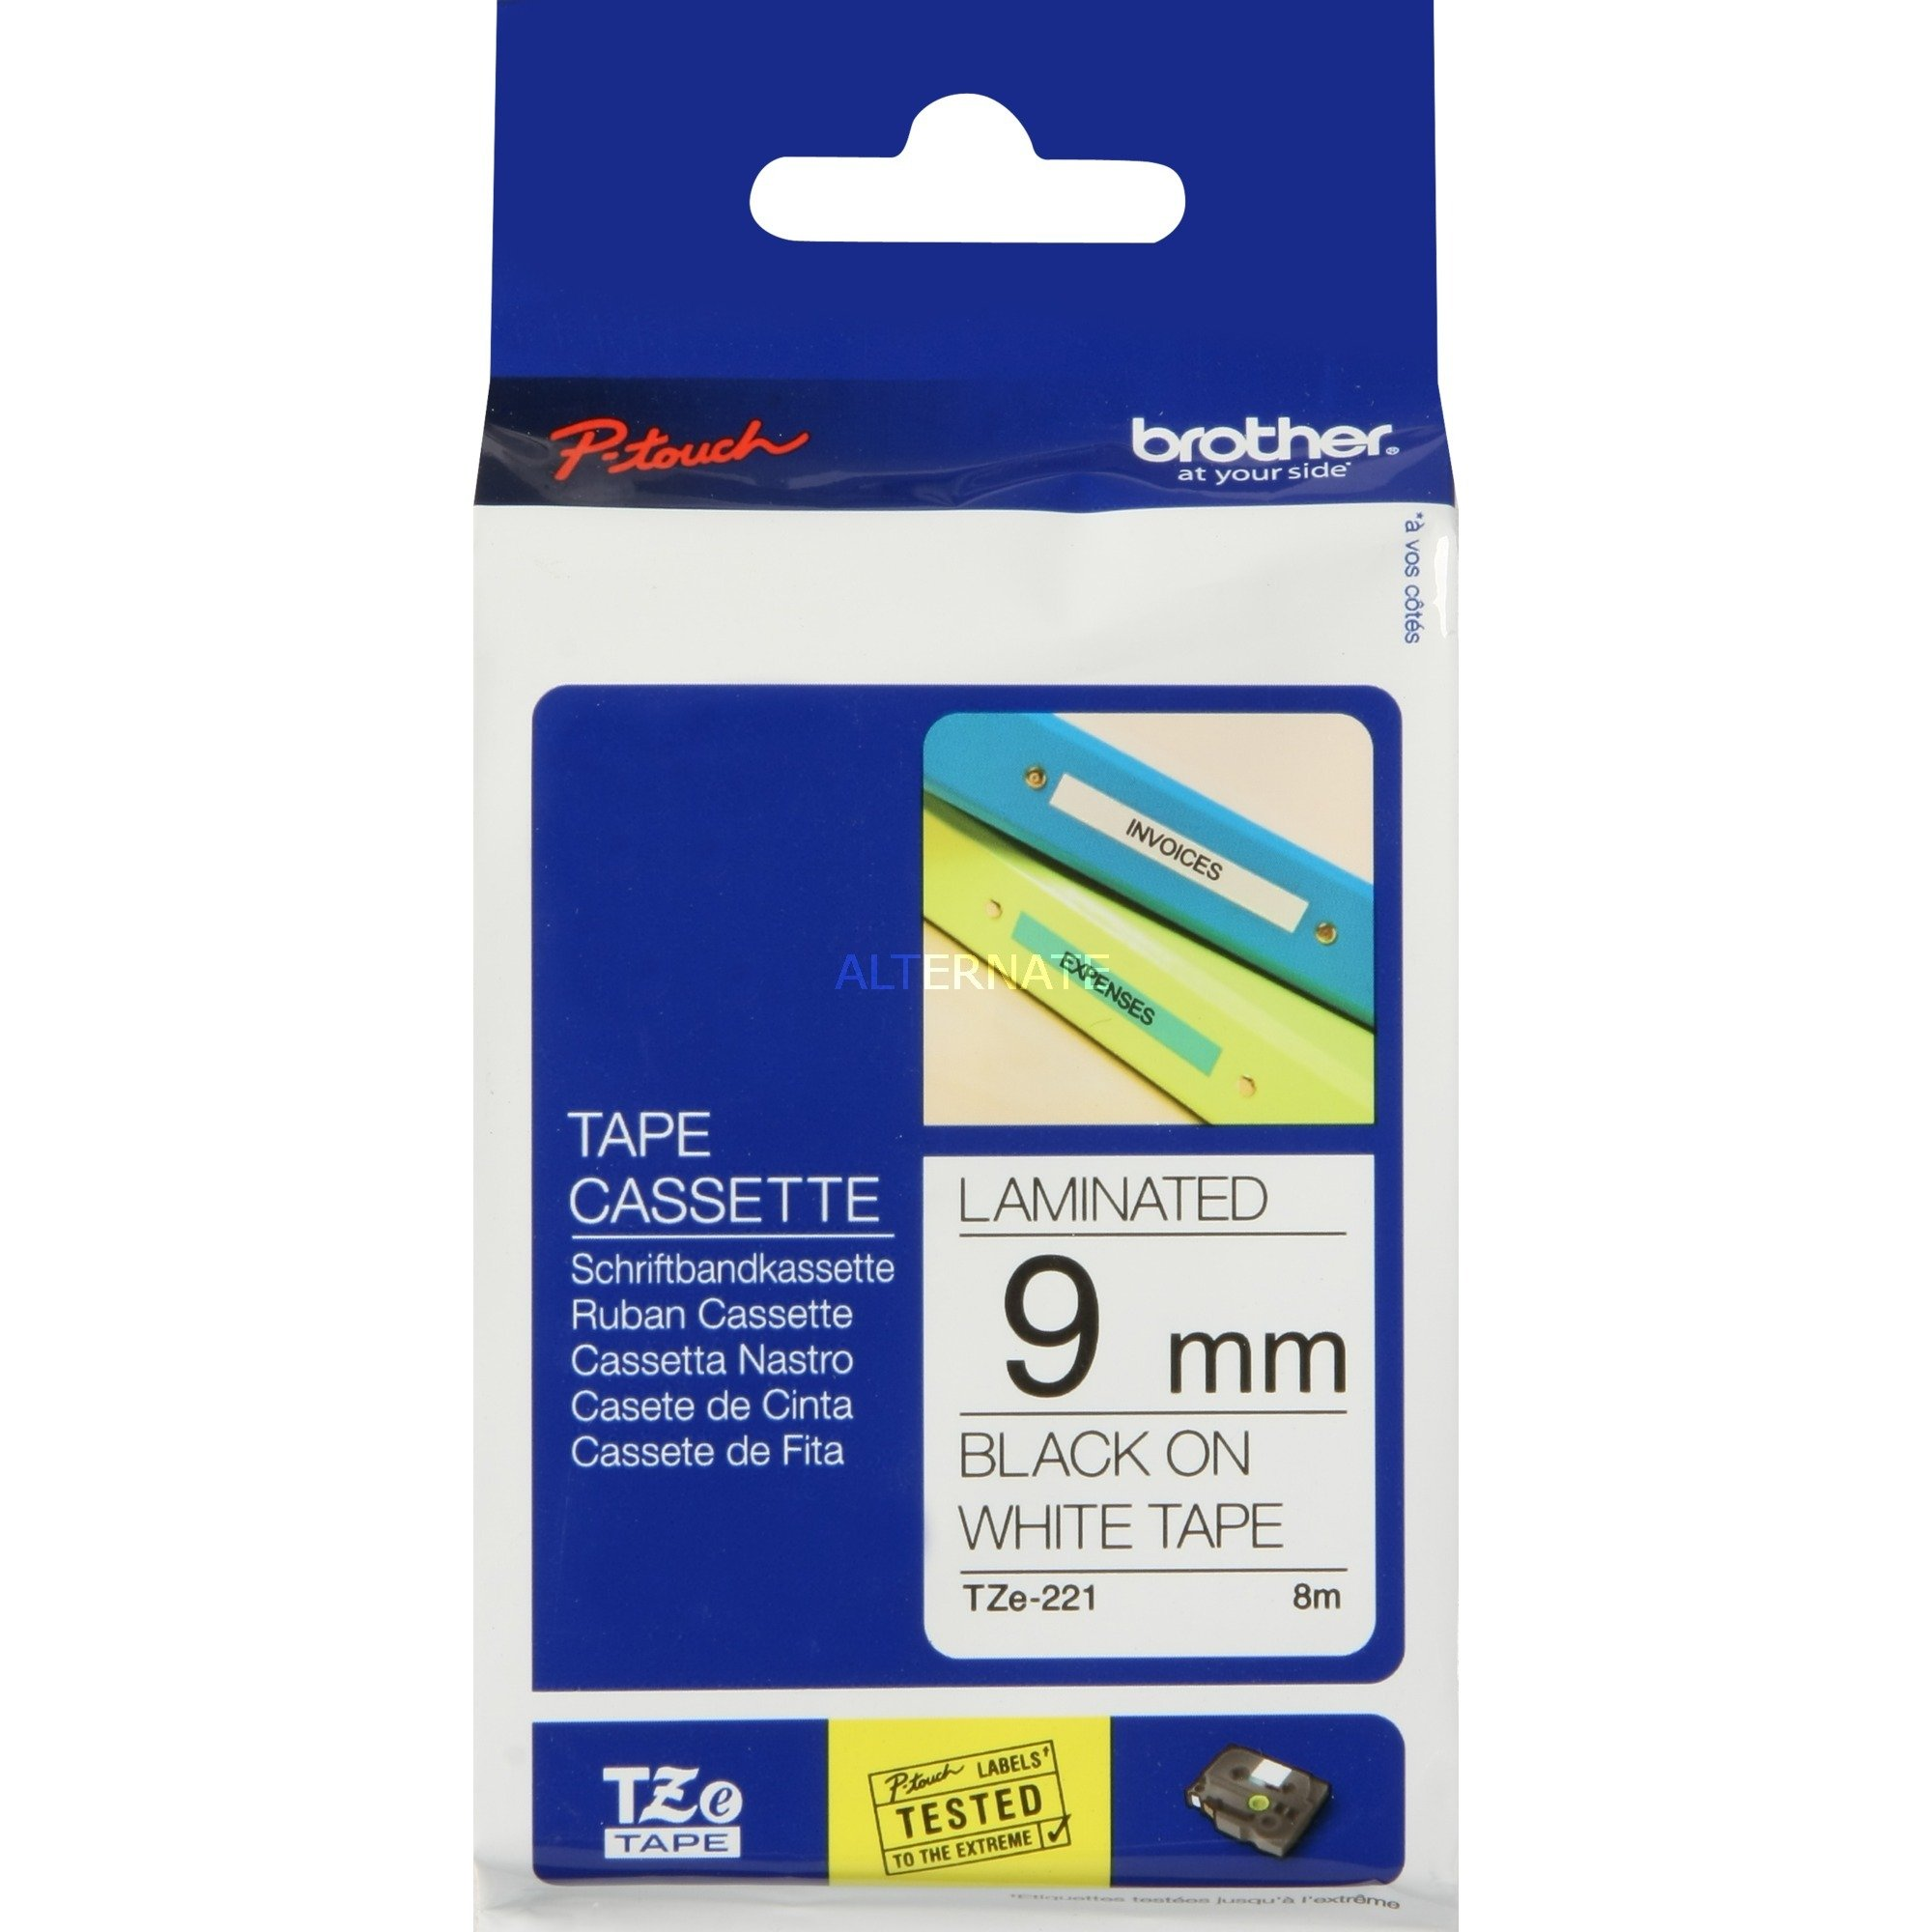 TZe-221 cinta para impresora de etiquetas Negro sobre blanco, Cinta de escritura